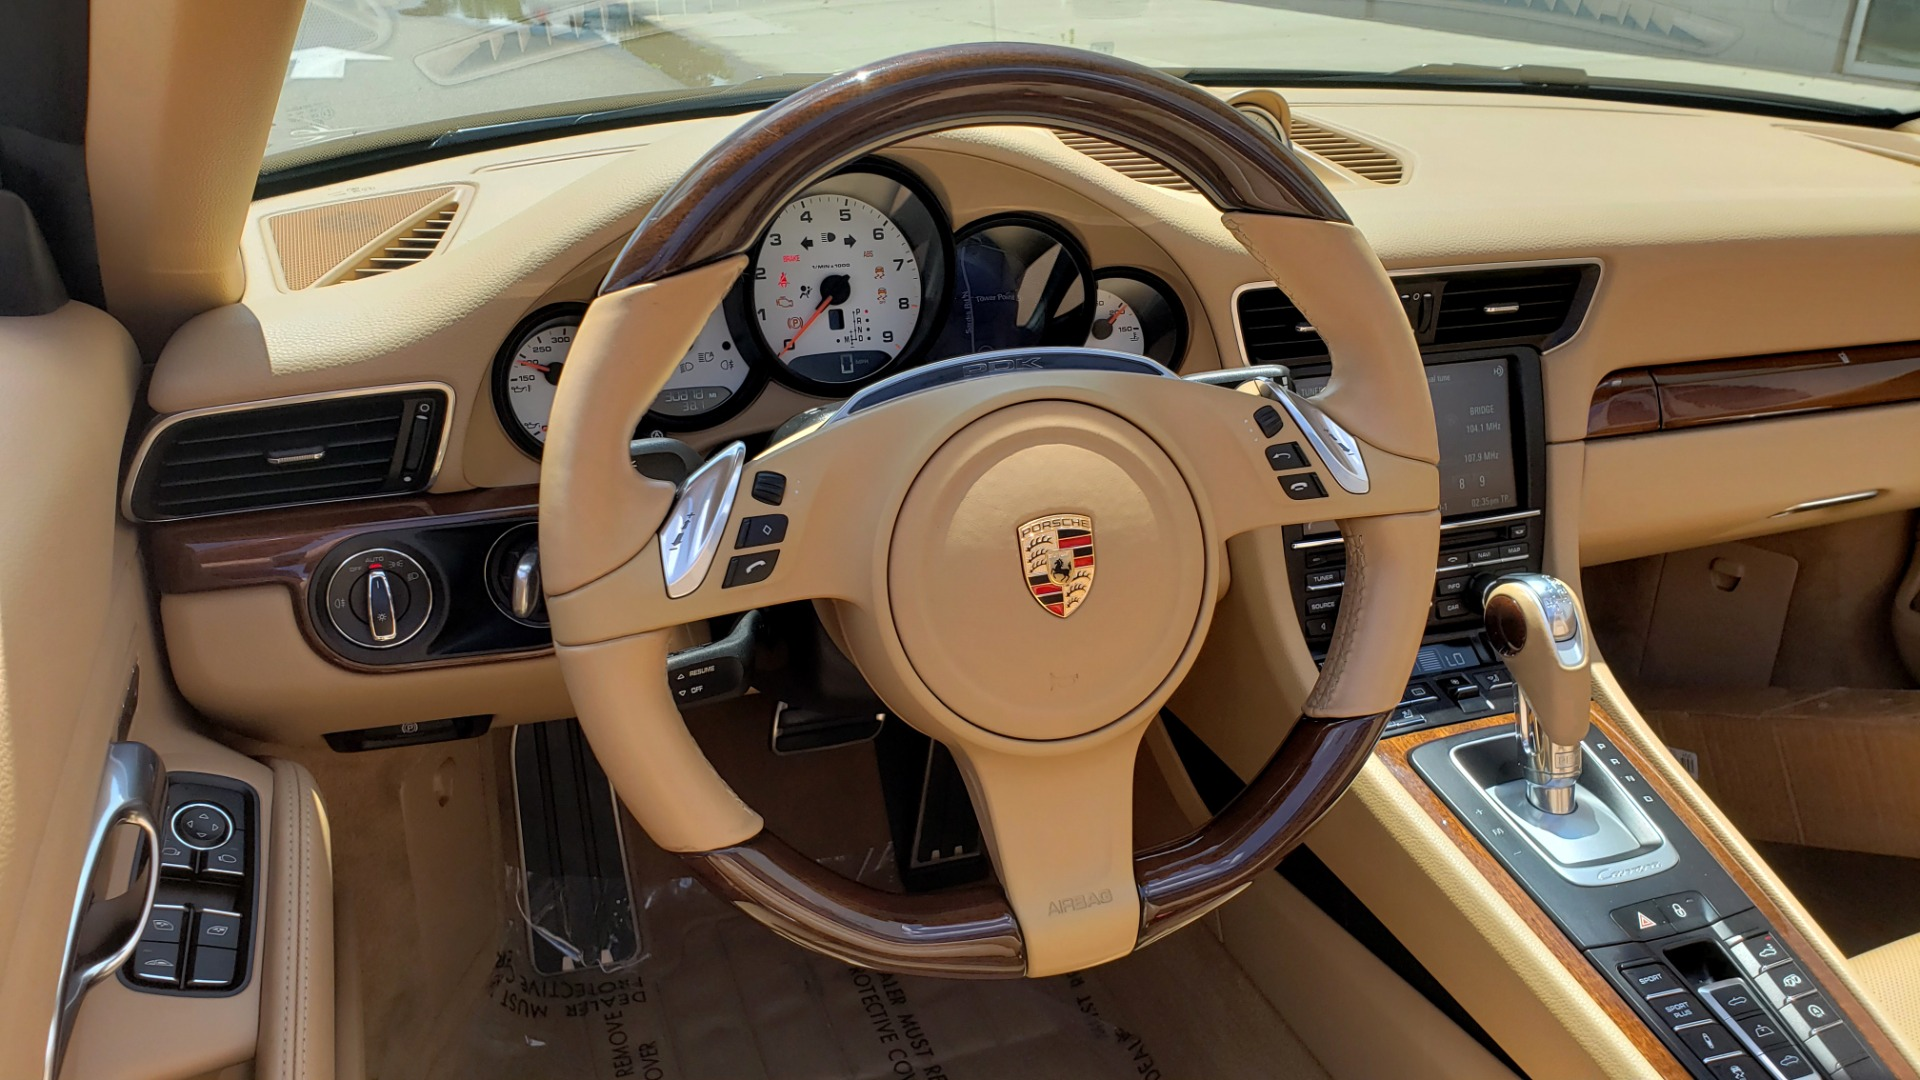 Used 2014 Porsche 911 CARRERA S CABRIOLET / PREM PKG / PDK / NAV / BOSE / SPORT CHRONO for sale $81,995 at Formula Imports in Charlotte NC 28227 19